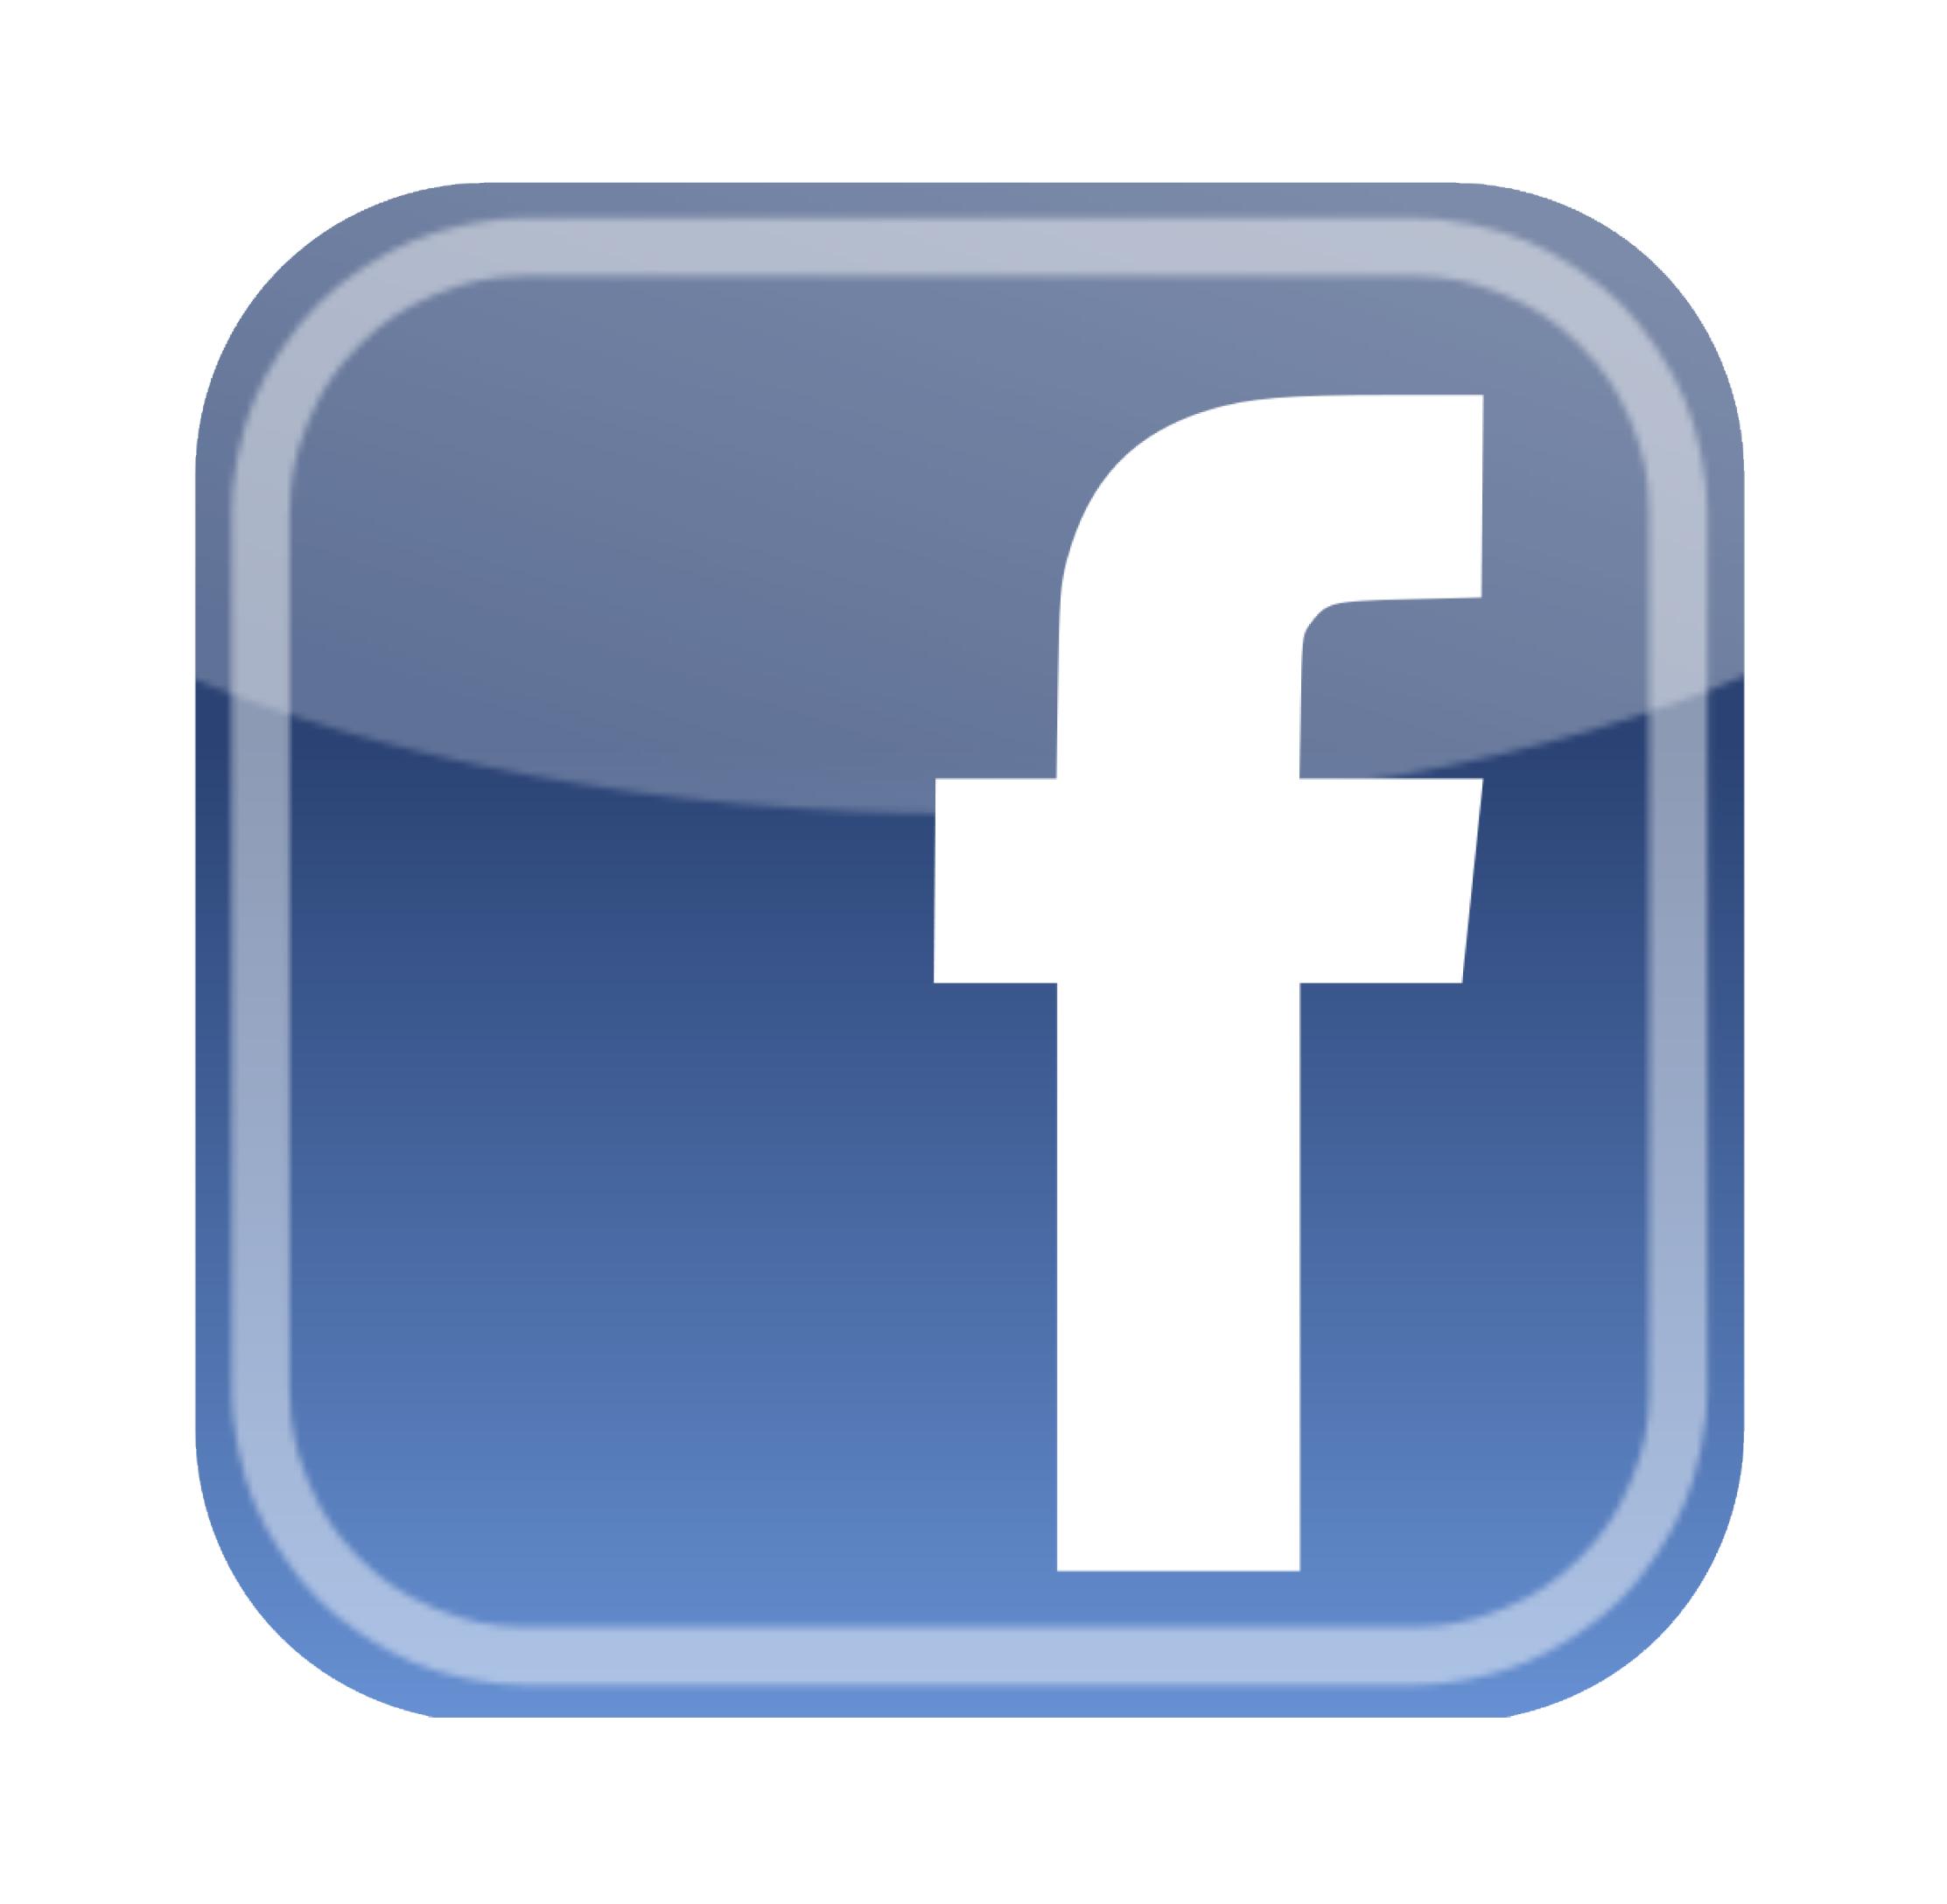 Renswoude Horse Trials Facebook pagina